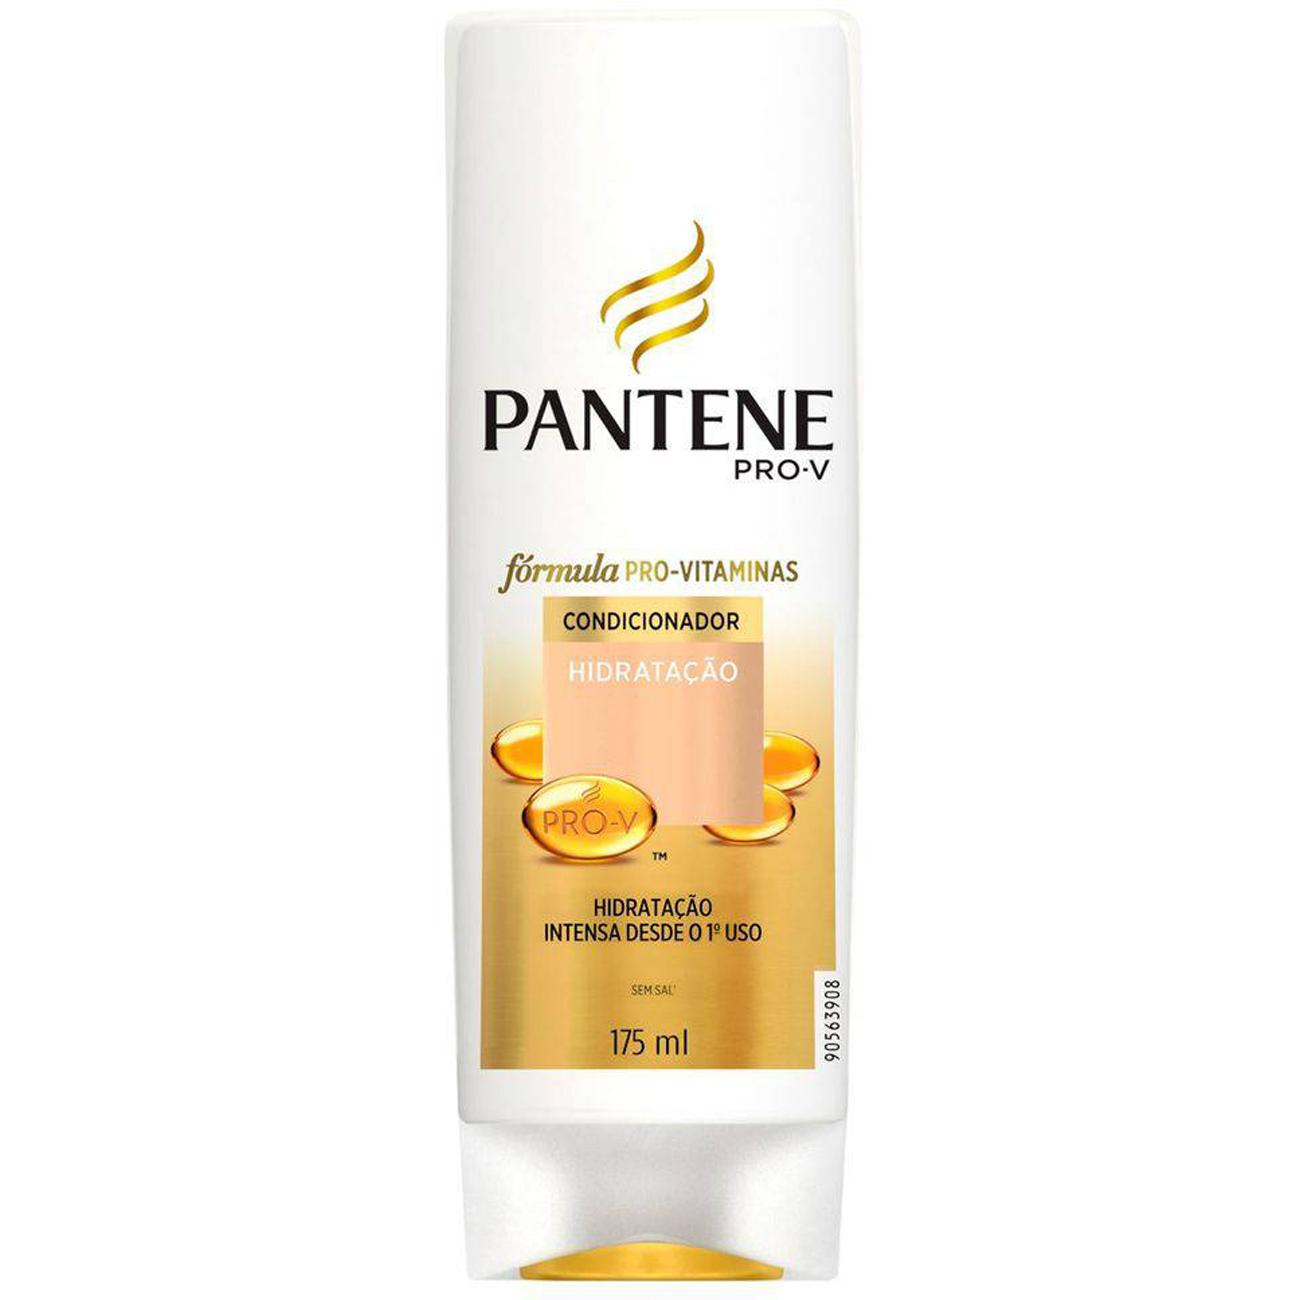 Condicionador Pantene 175Ml Frhidratacao